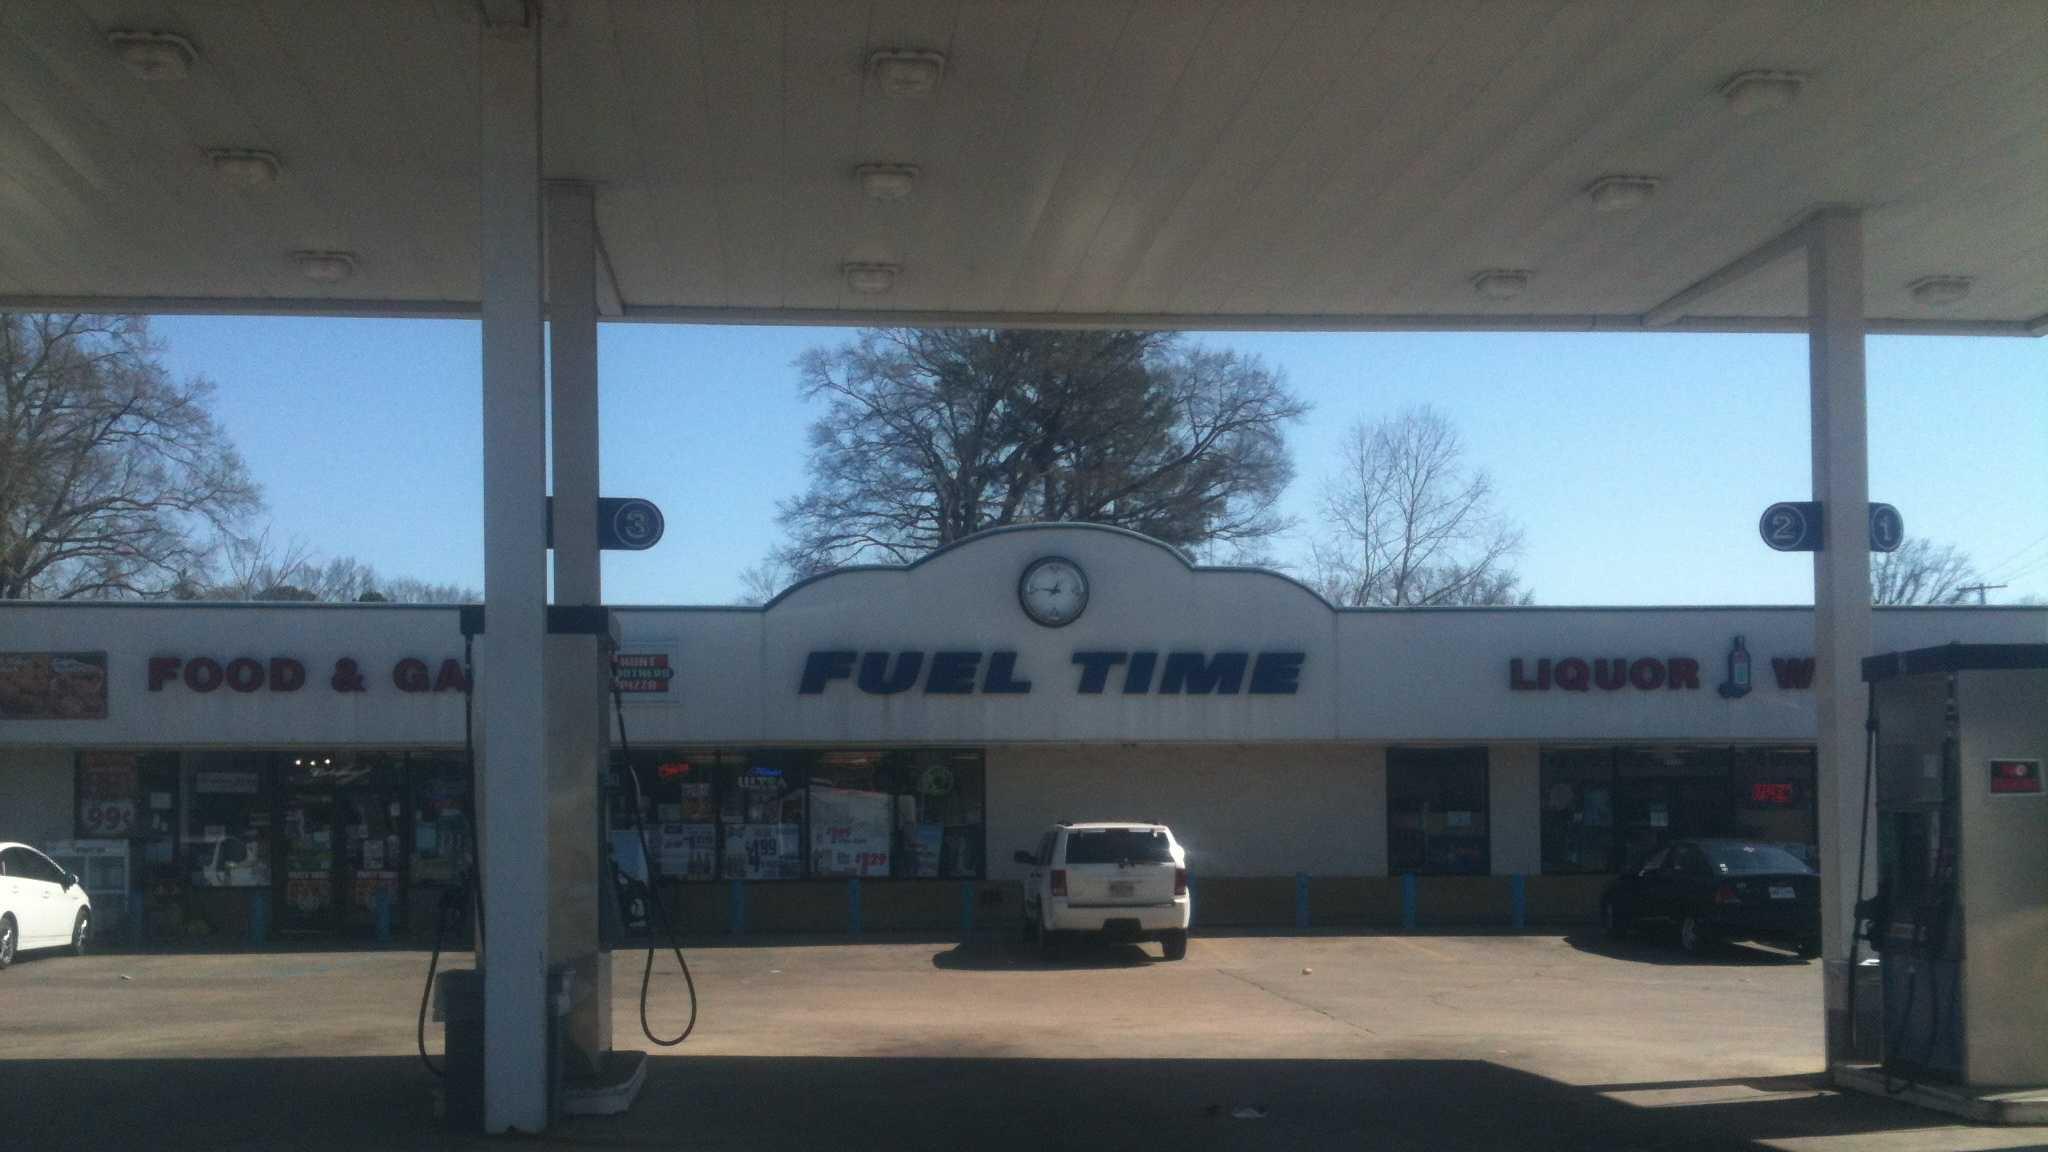 Fuel Time on Bullard